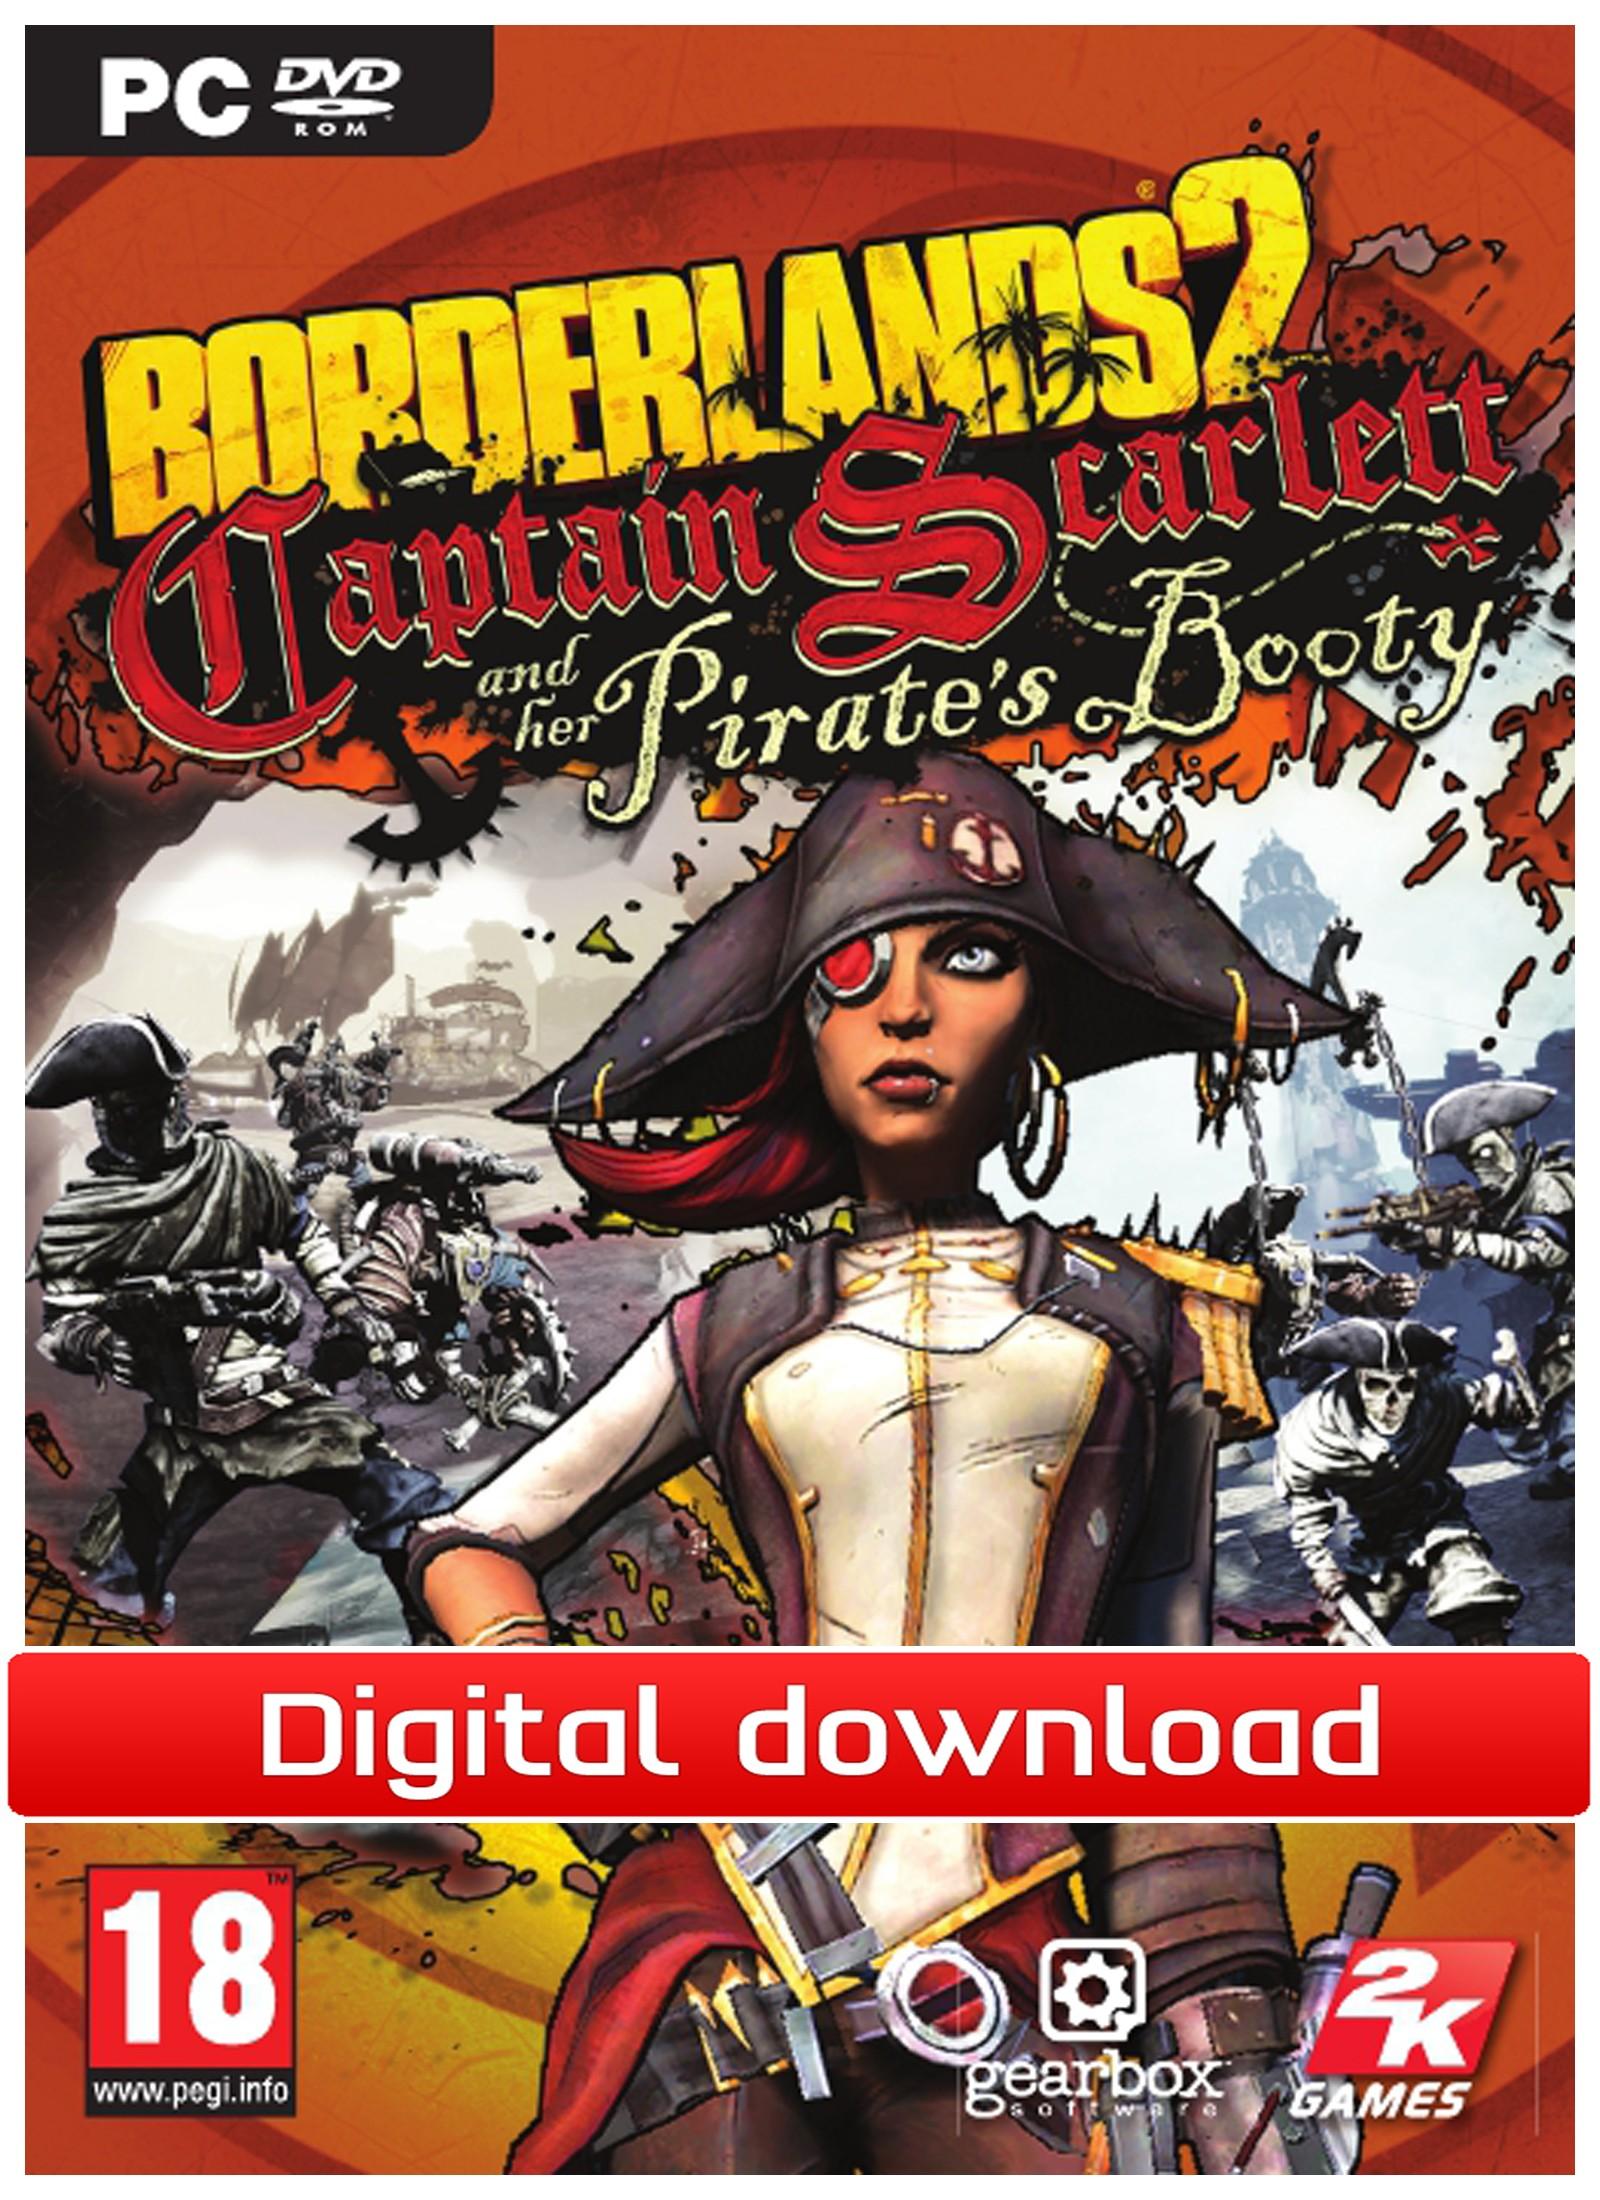 Borderlands 2: Captain Scarlett (PC nedlastning) PCDD30812